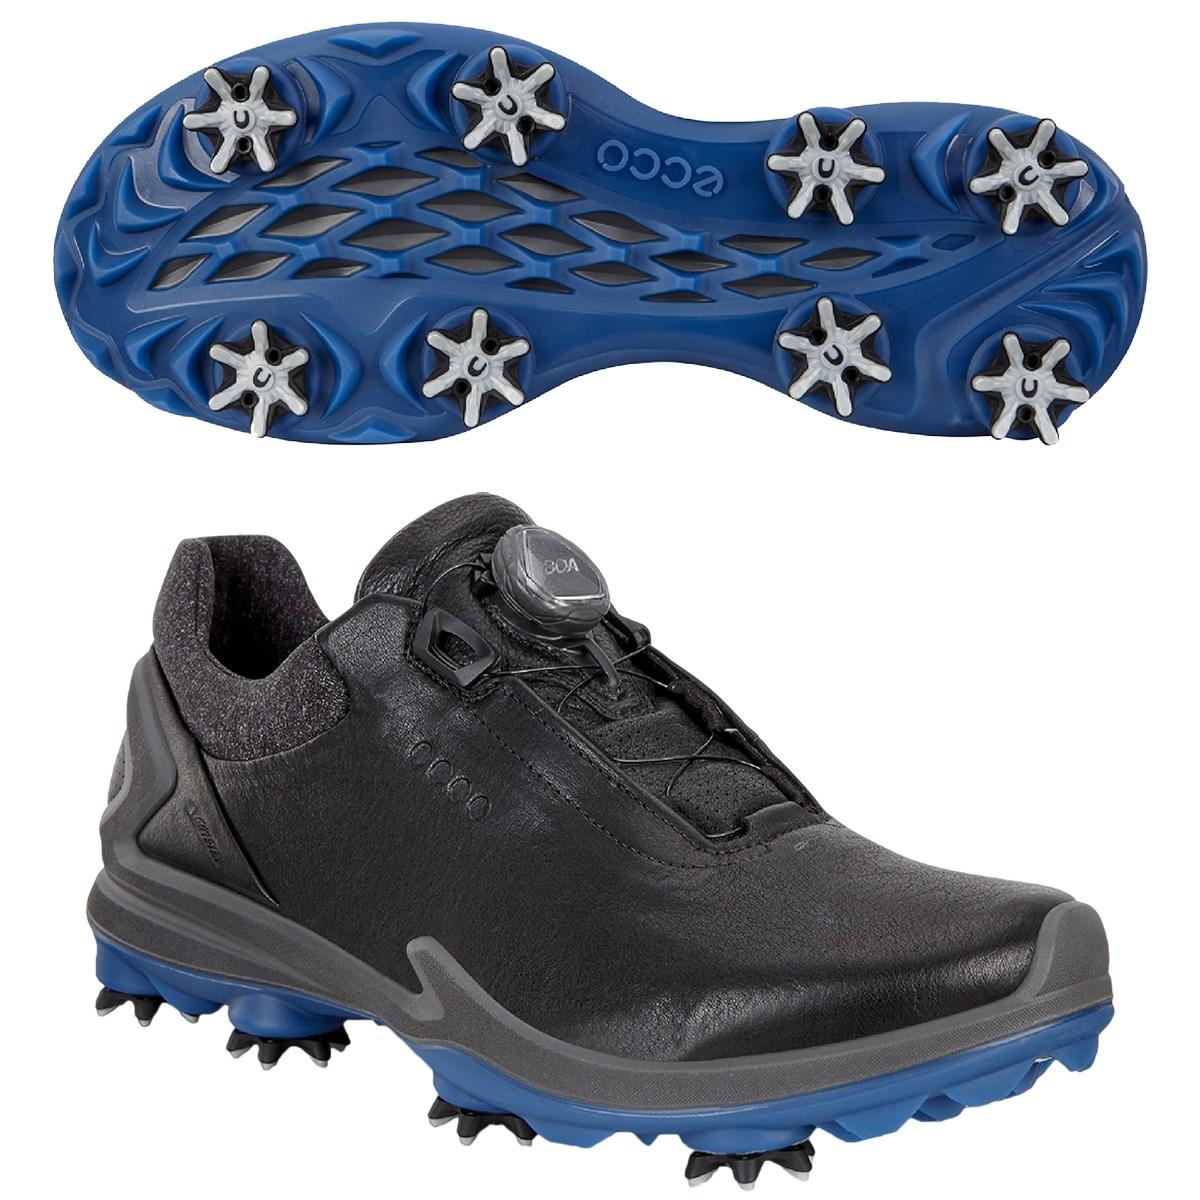 ecco エコー ゴルフ バイオム G3 BOA GTX シューズ 26cm/EUサイズ41 ブラック